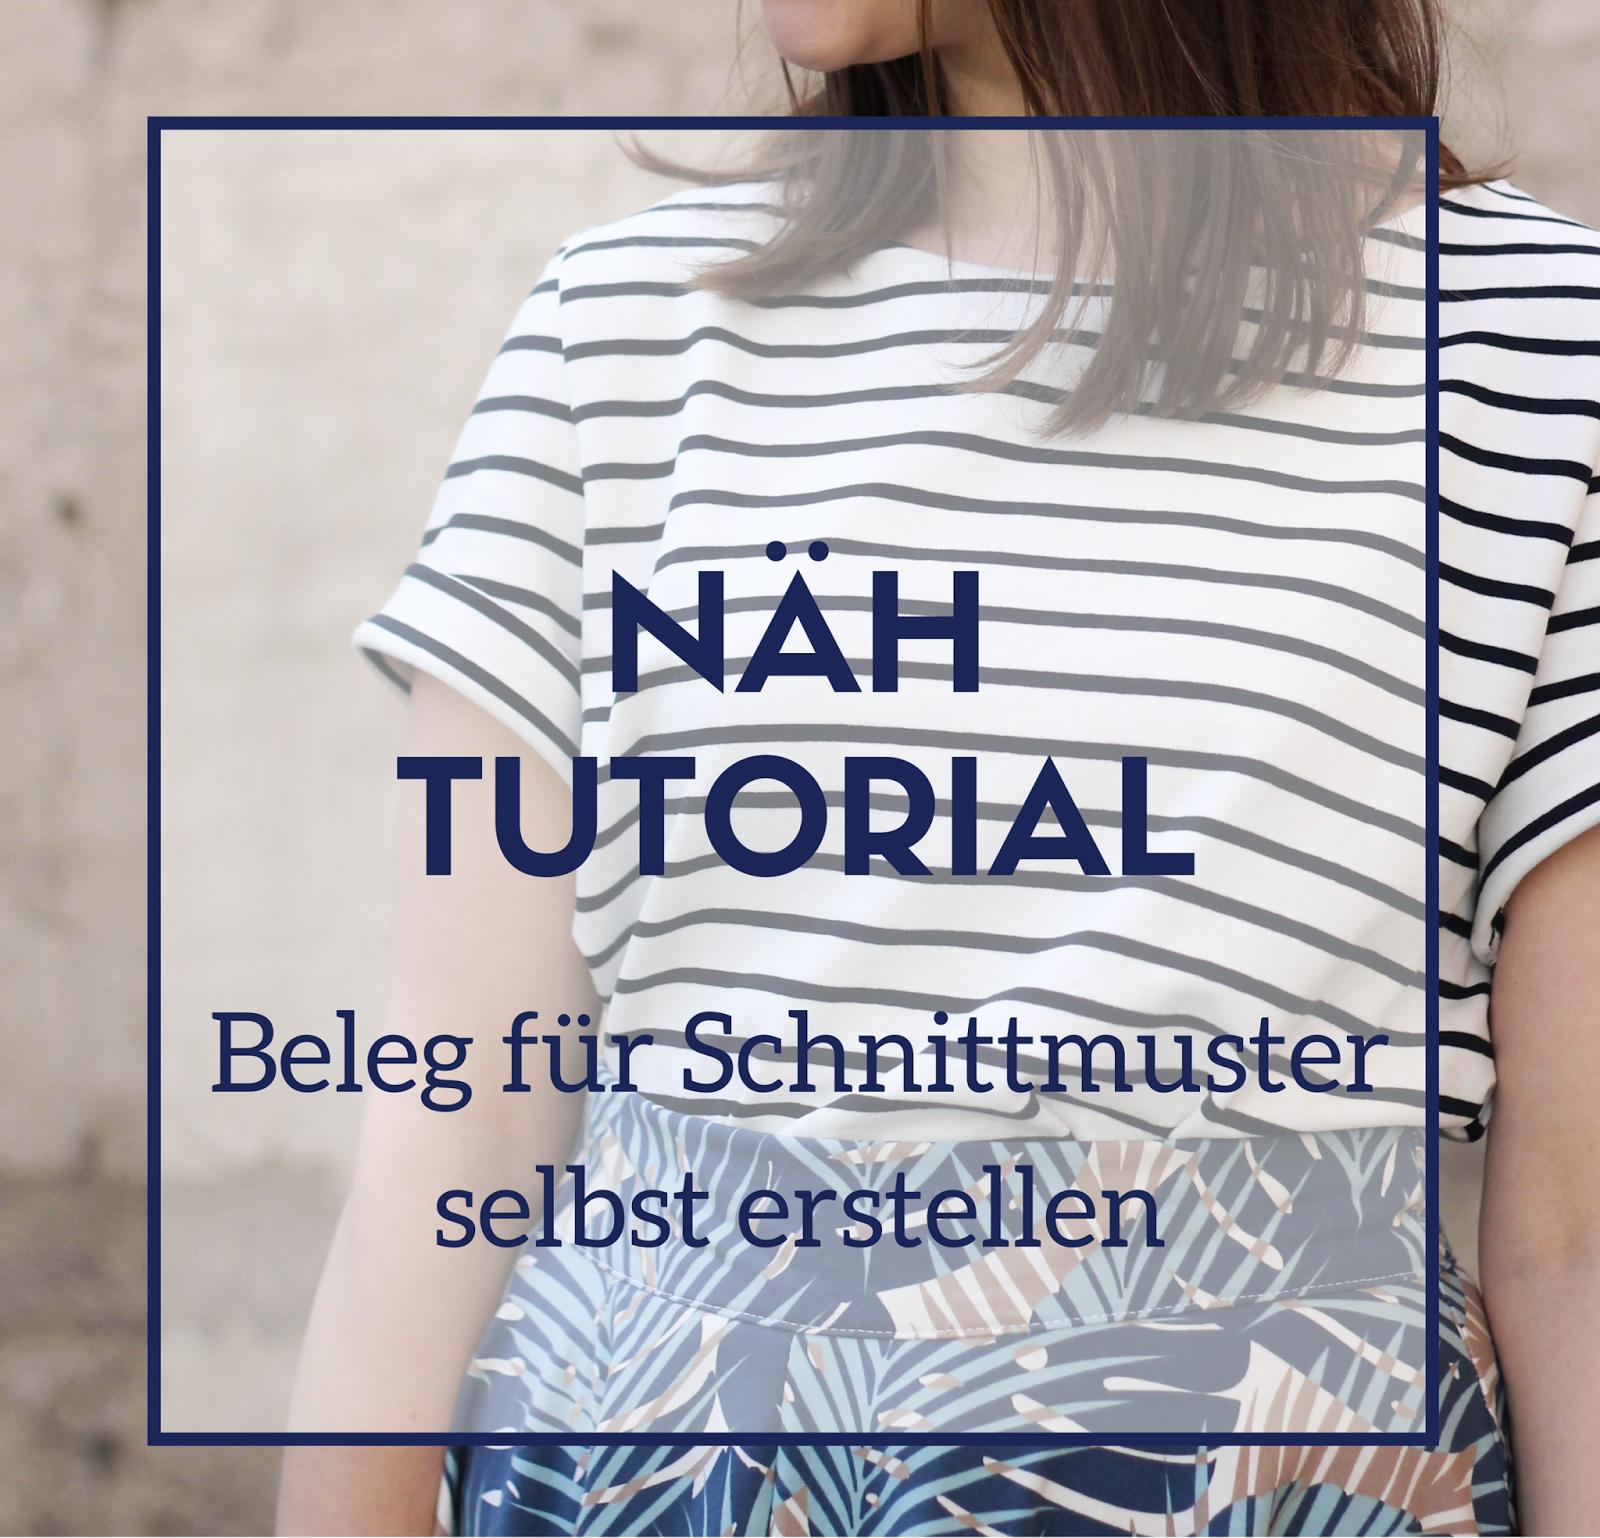 Großzügig Schnittmuster Tutorial Galerie - Strickmuster-Ideen ...